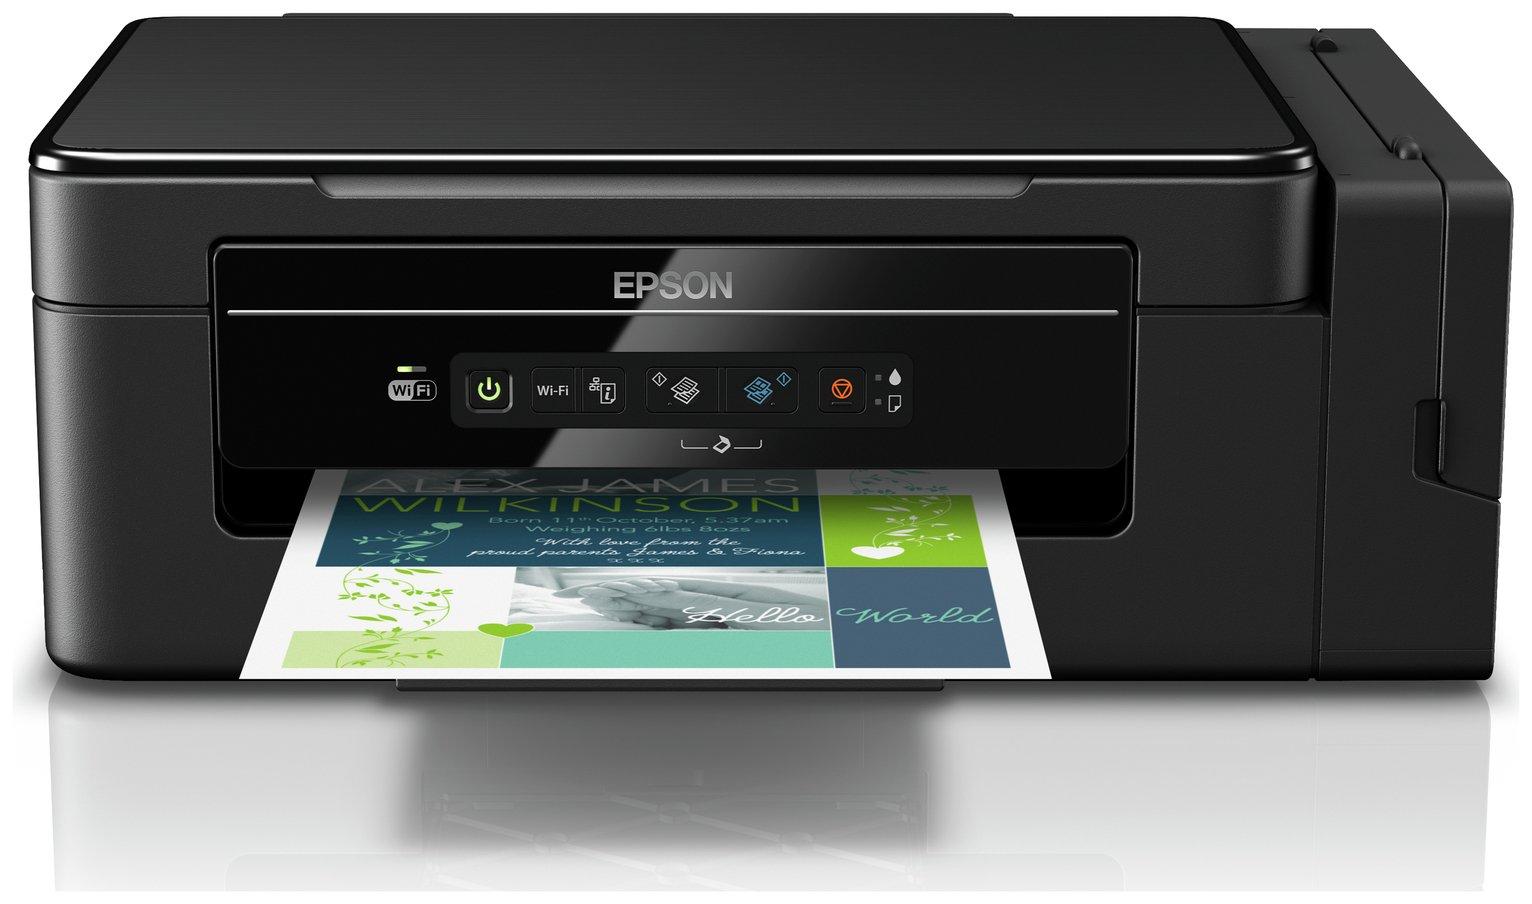 Epson EcoTank ET-2600 Wireless Ink Tank Printer